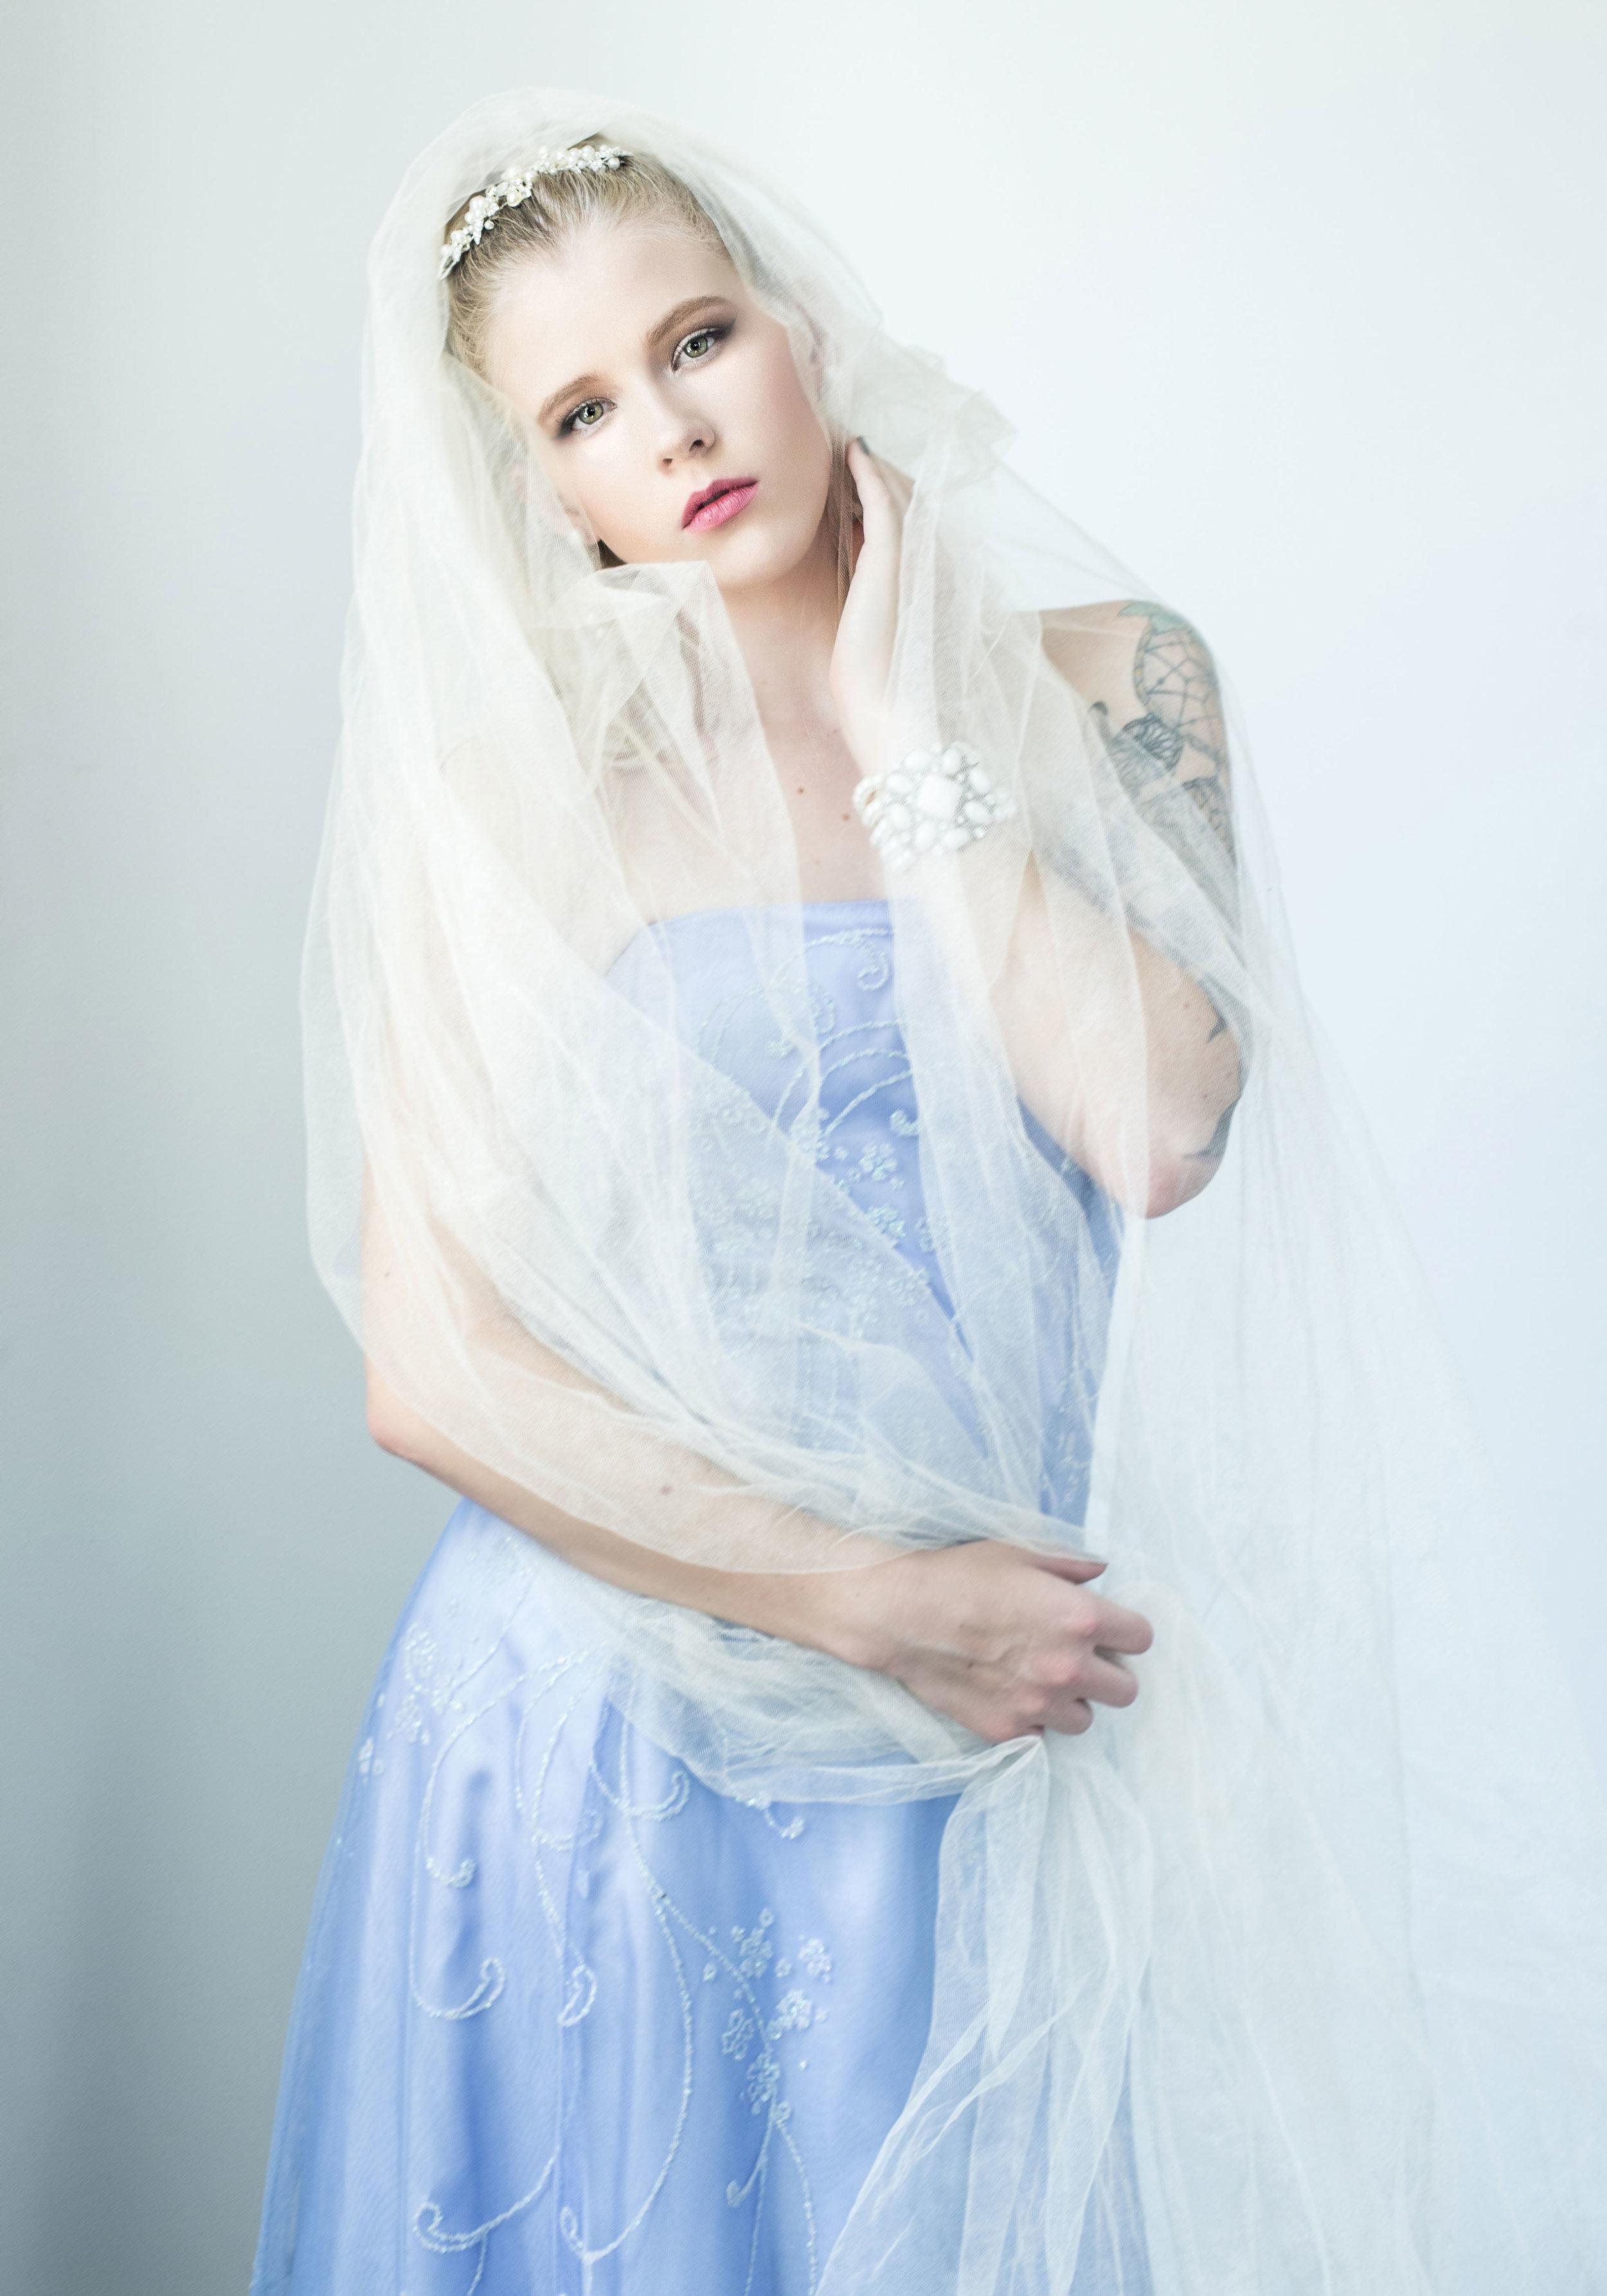 best-portrait-photographer-colorado-springs-9825.jpg